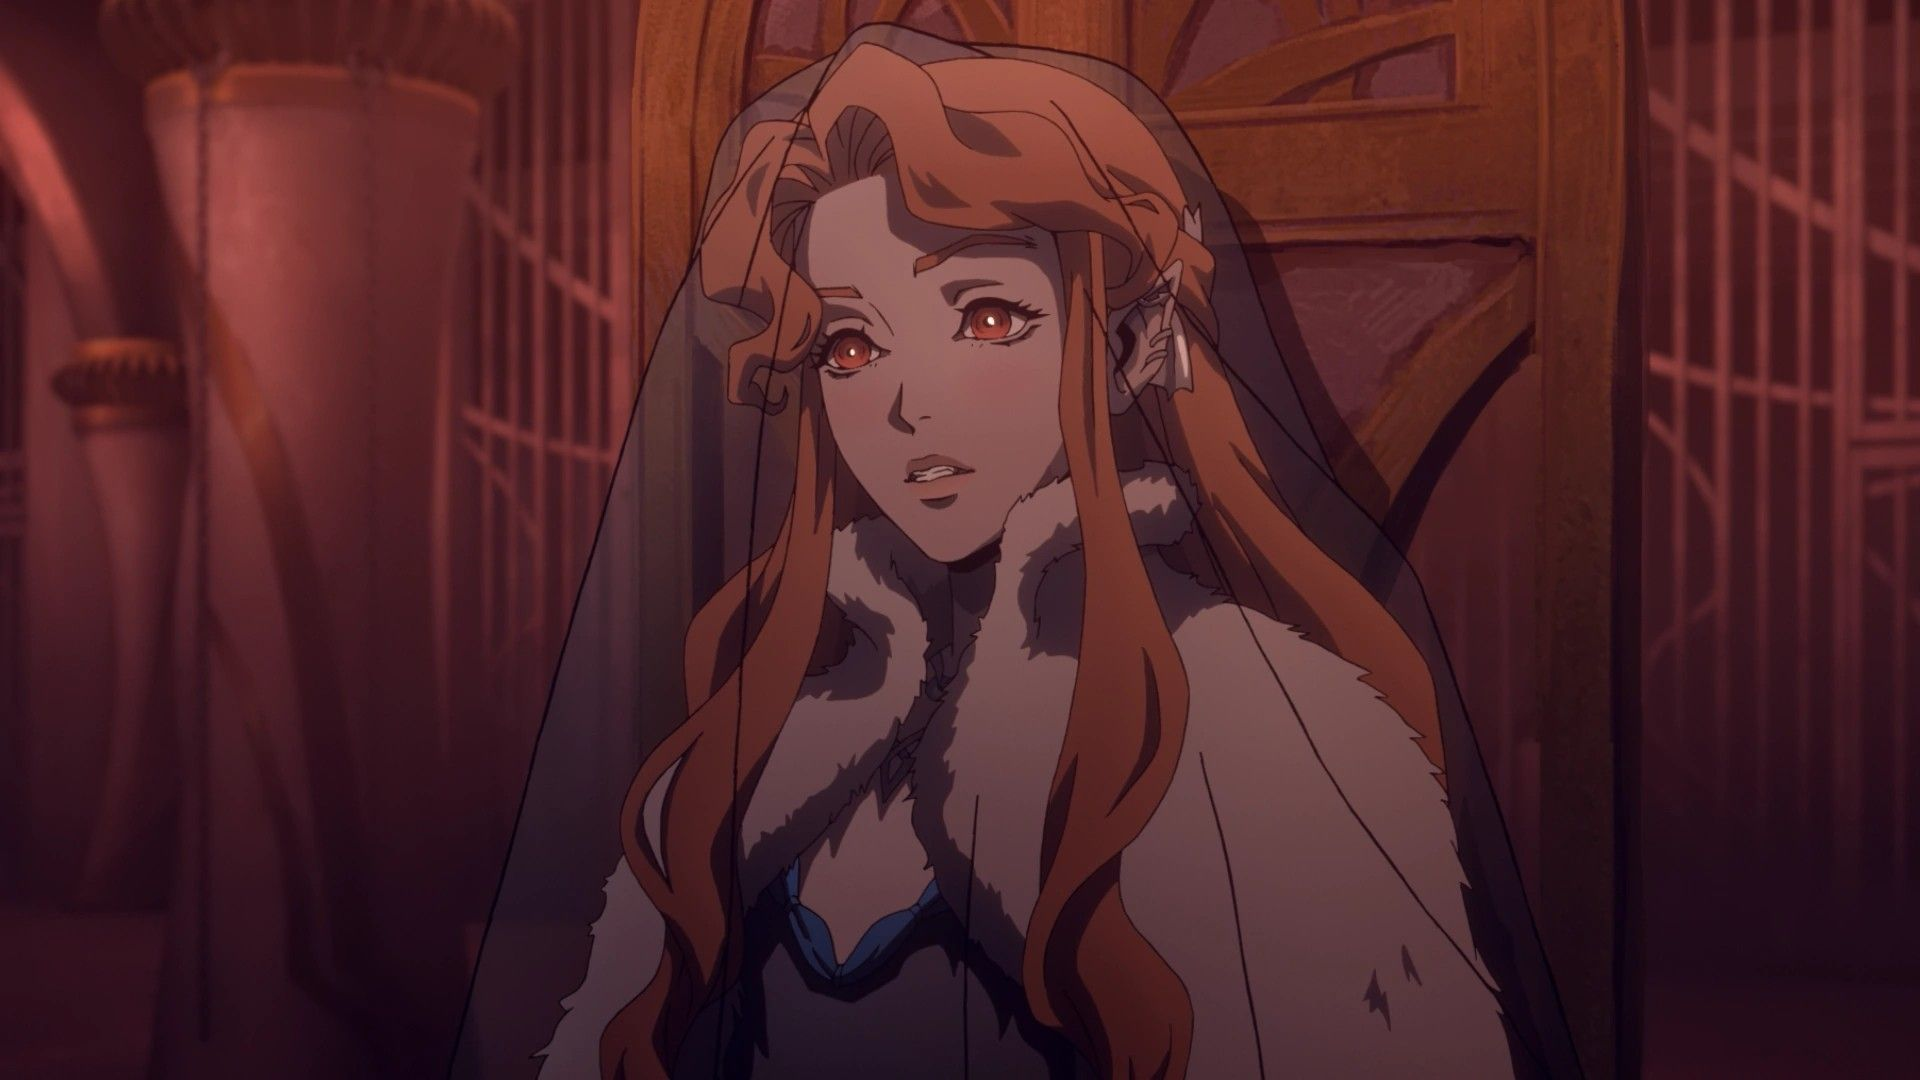 Lenore, castlevania in 2020 Villain character, Neon